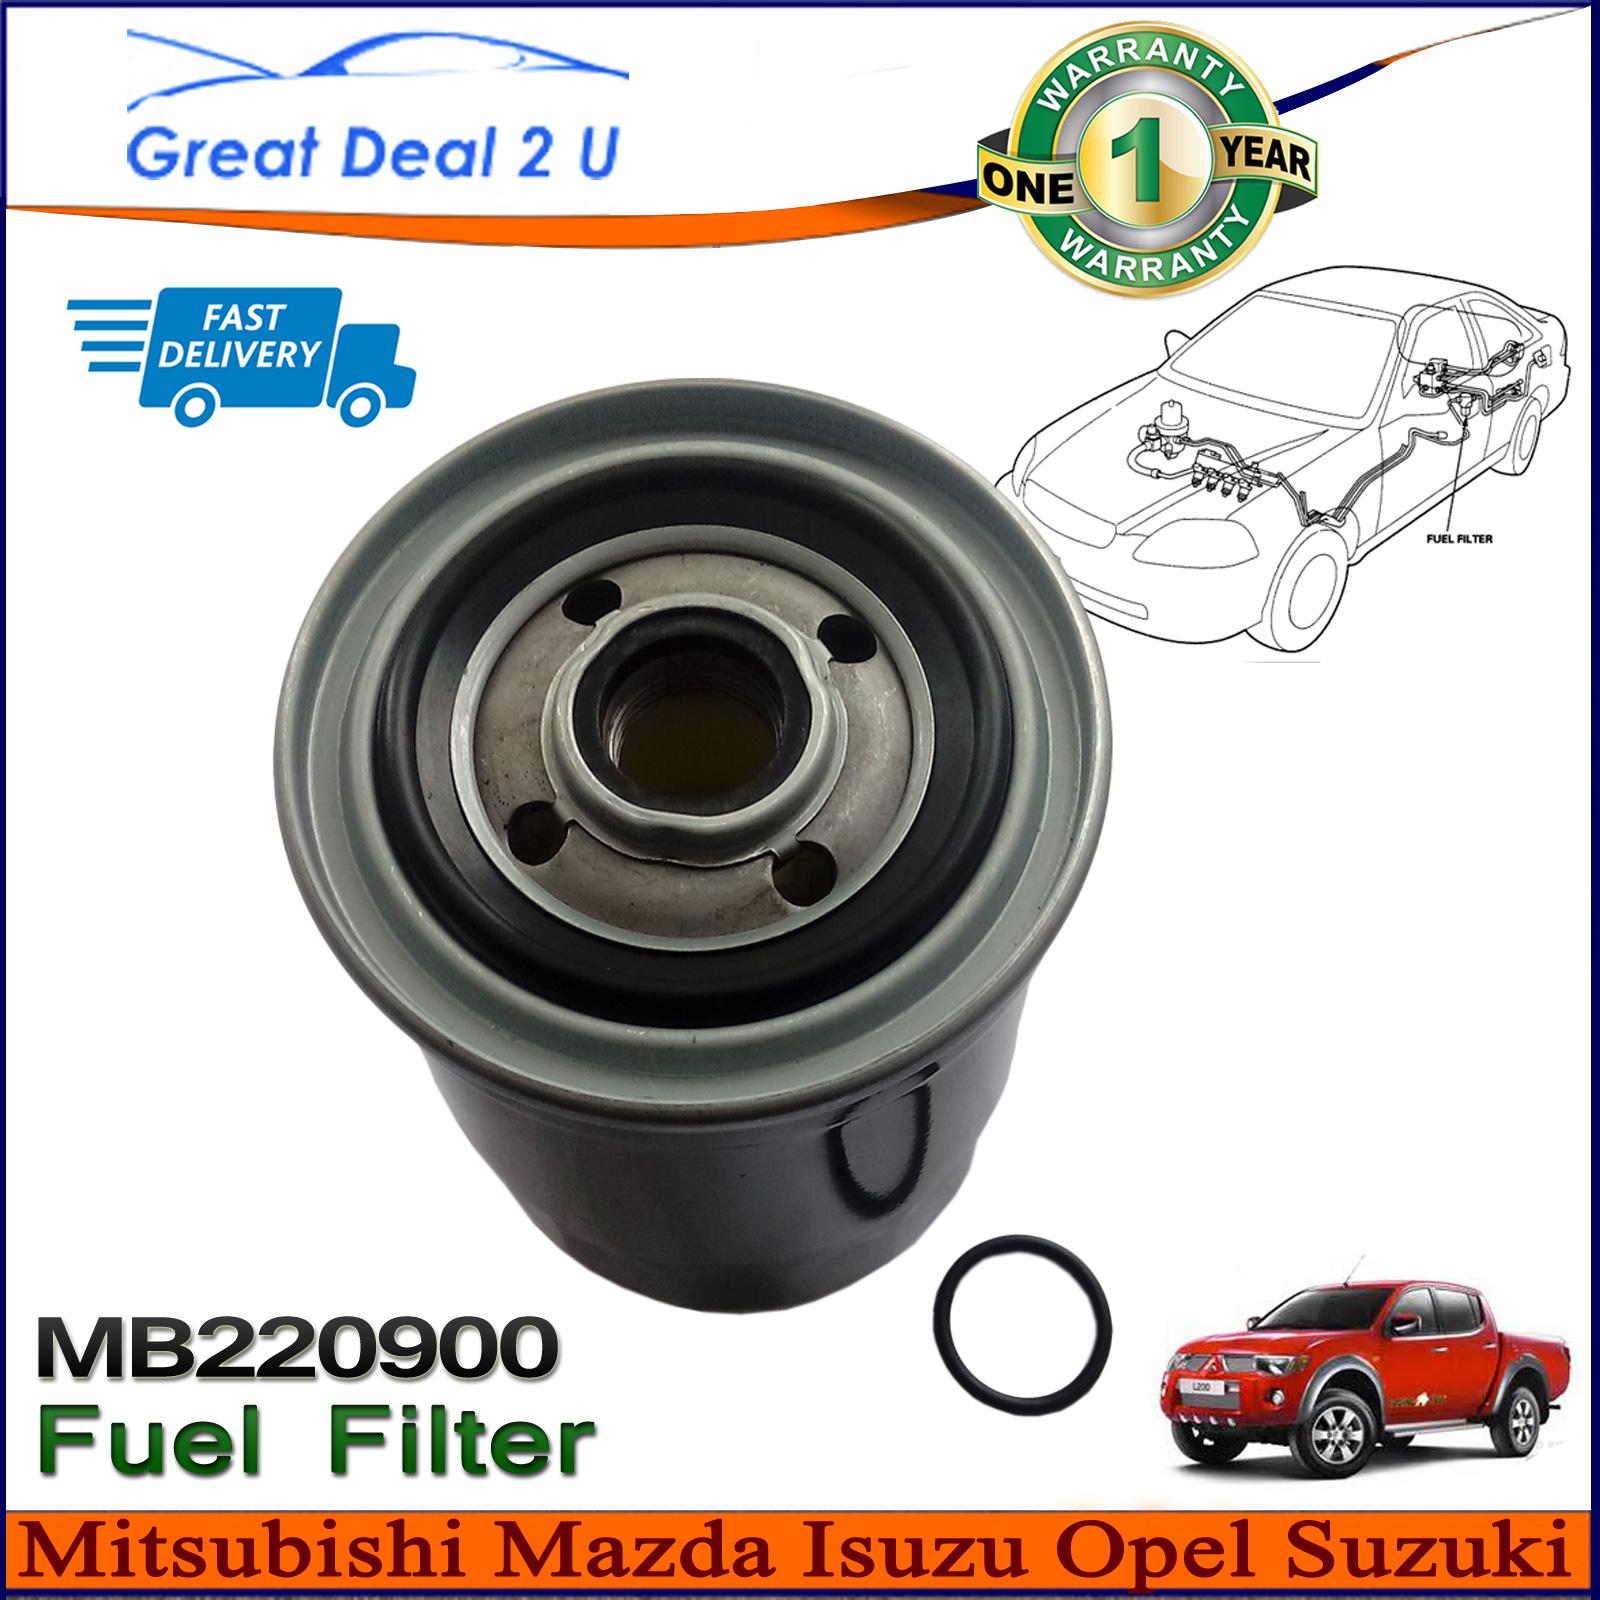 MB220900 Fuel Filter Mitsubishi Daihatsu Isuzu Suzuki Mazda Opel Vauxhall  Hyundai Daf 55